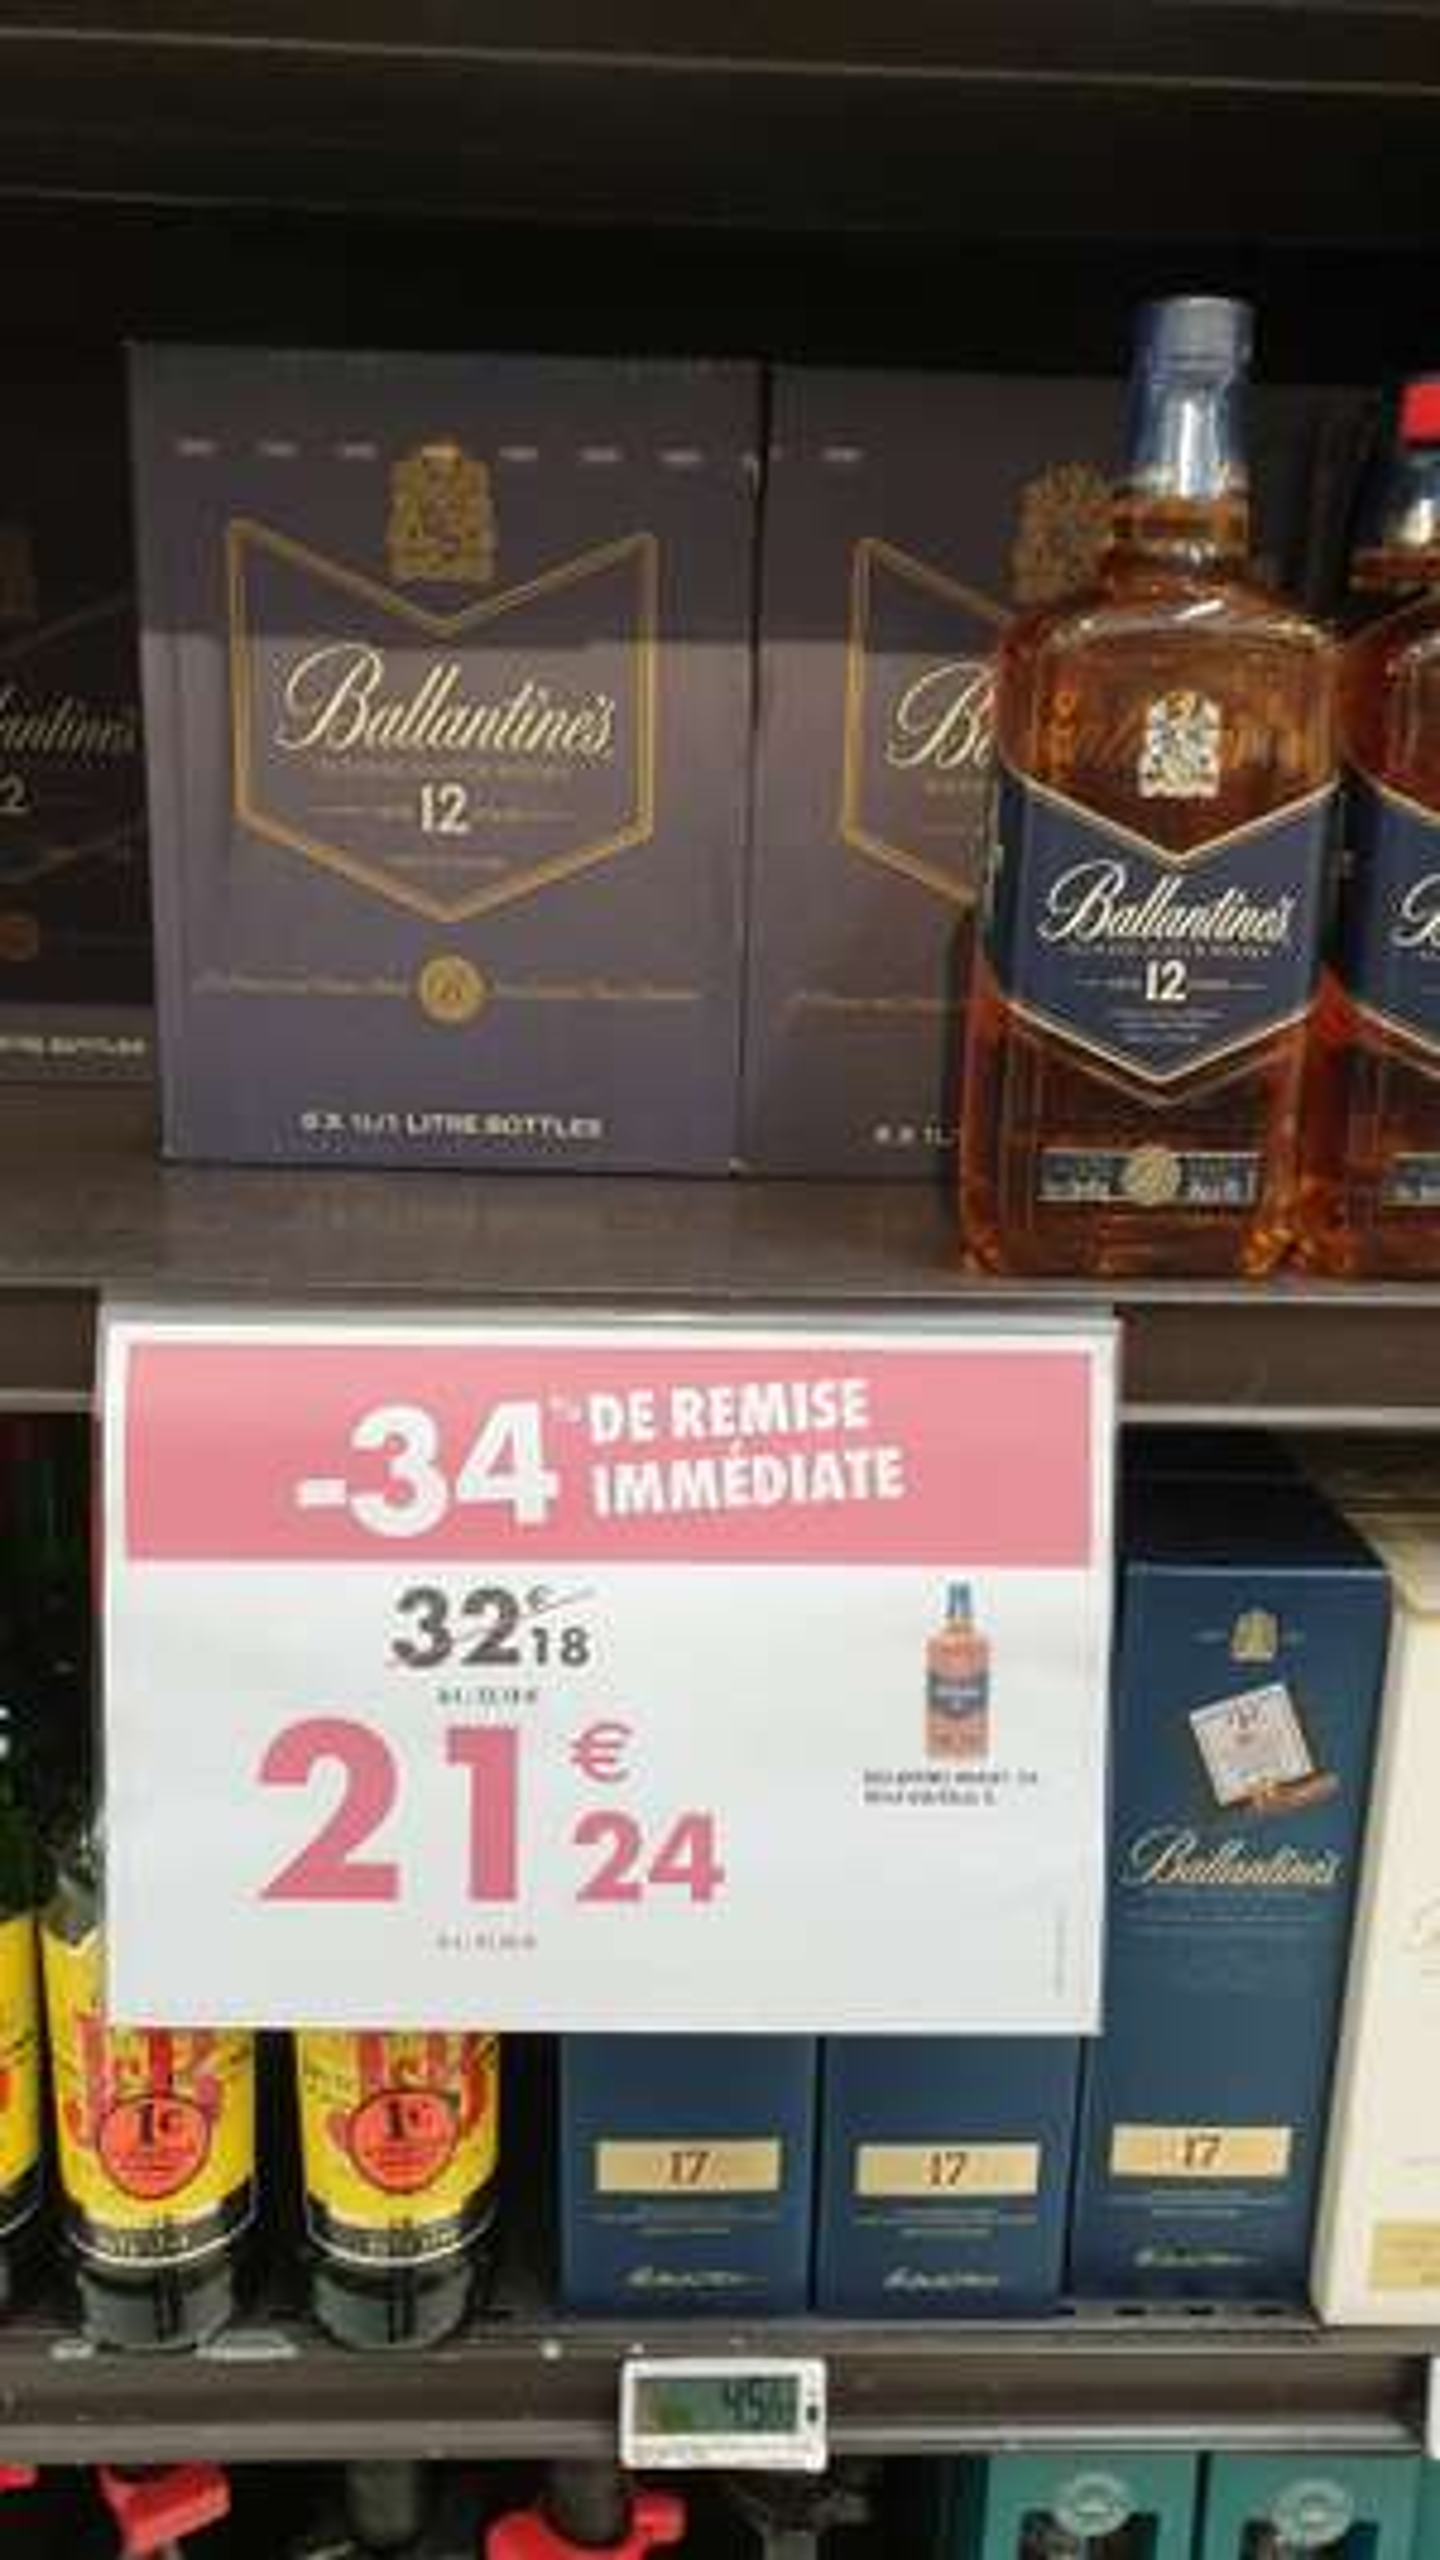 Bouteille Scotch Whisky Ballantine's 12 ans d'âge (1 L) - Claye Souilly (77)